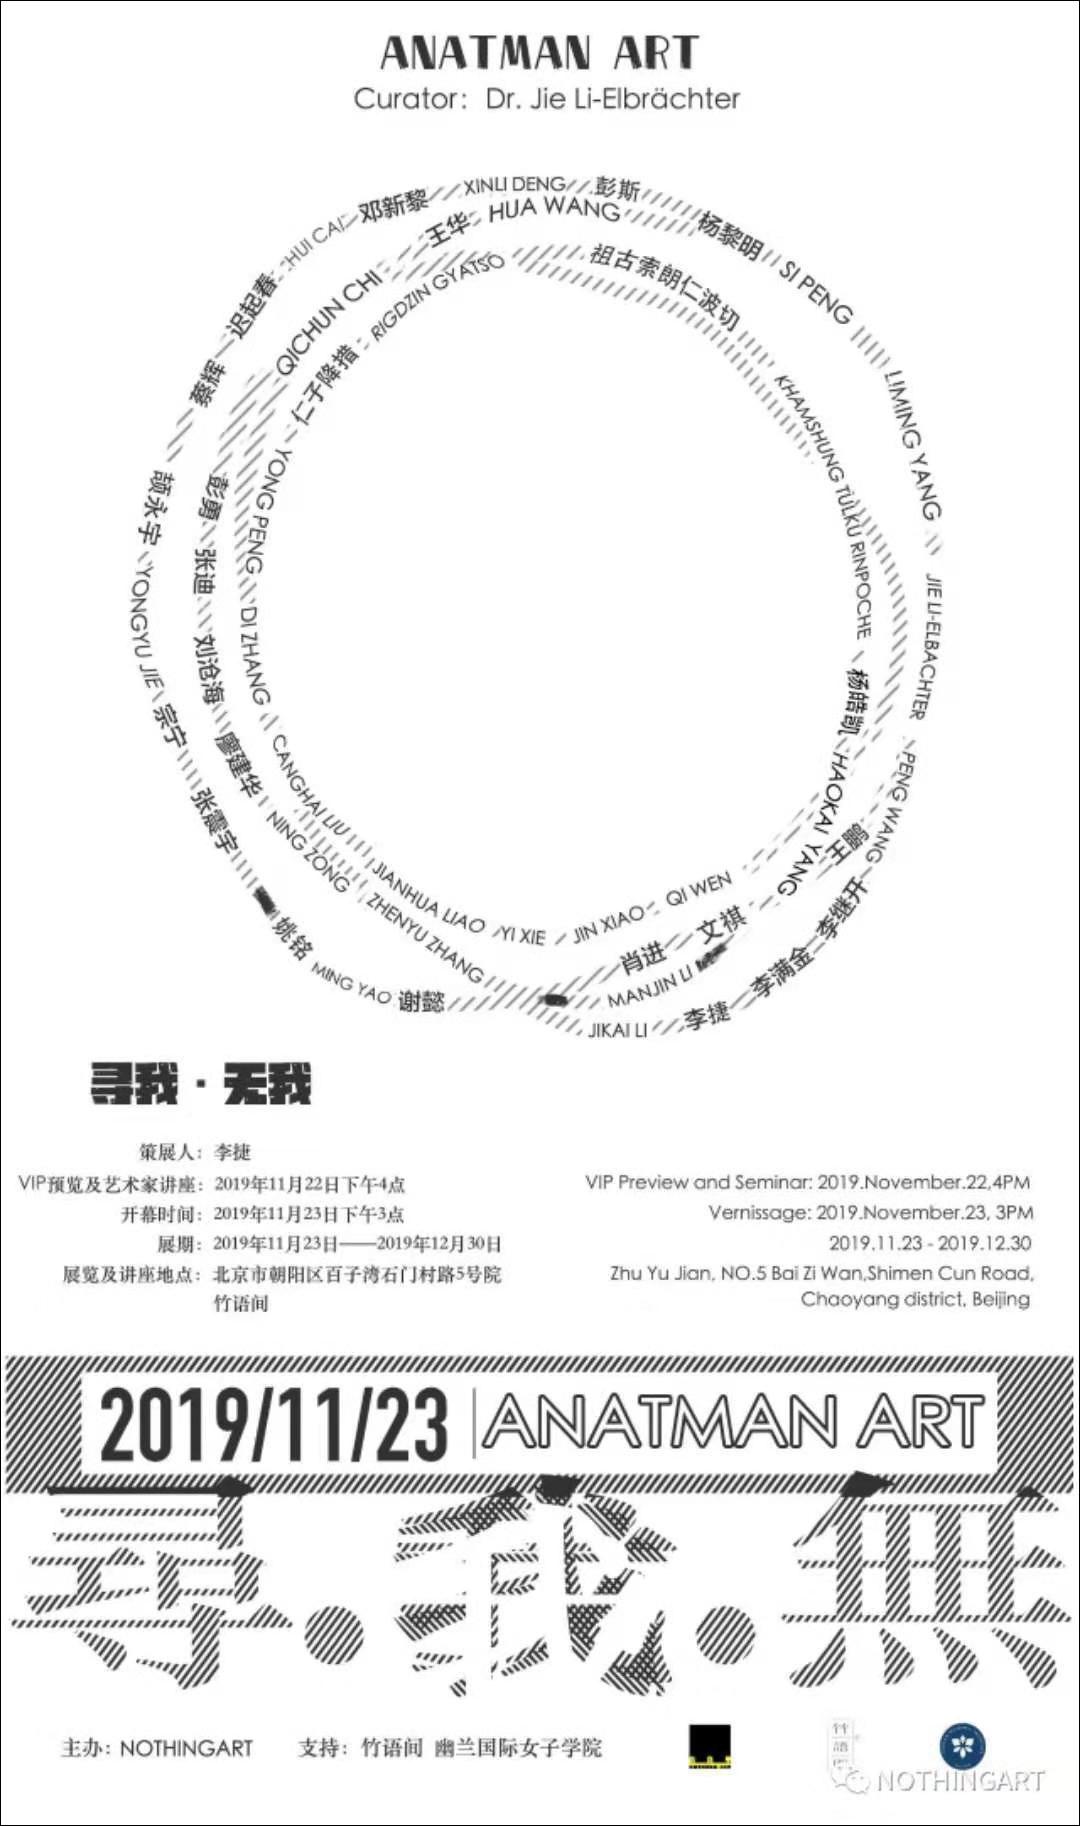 •  2019 INVITATION TO ANATMAN ART